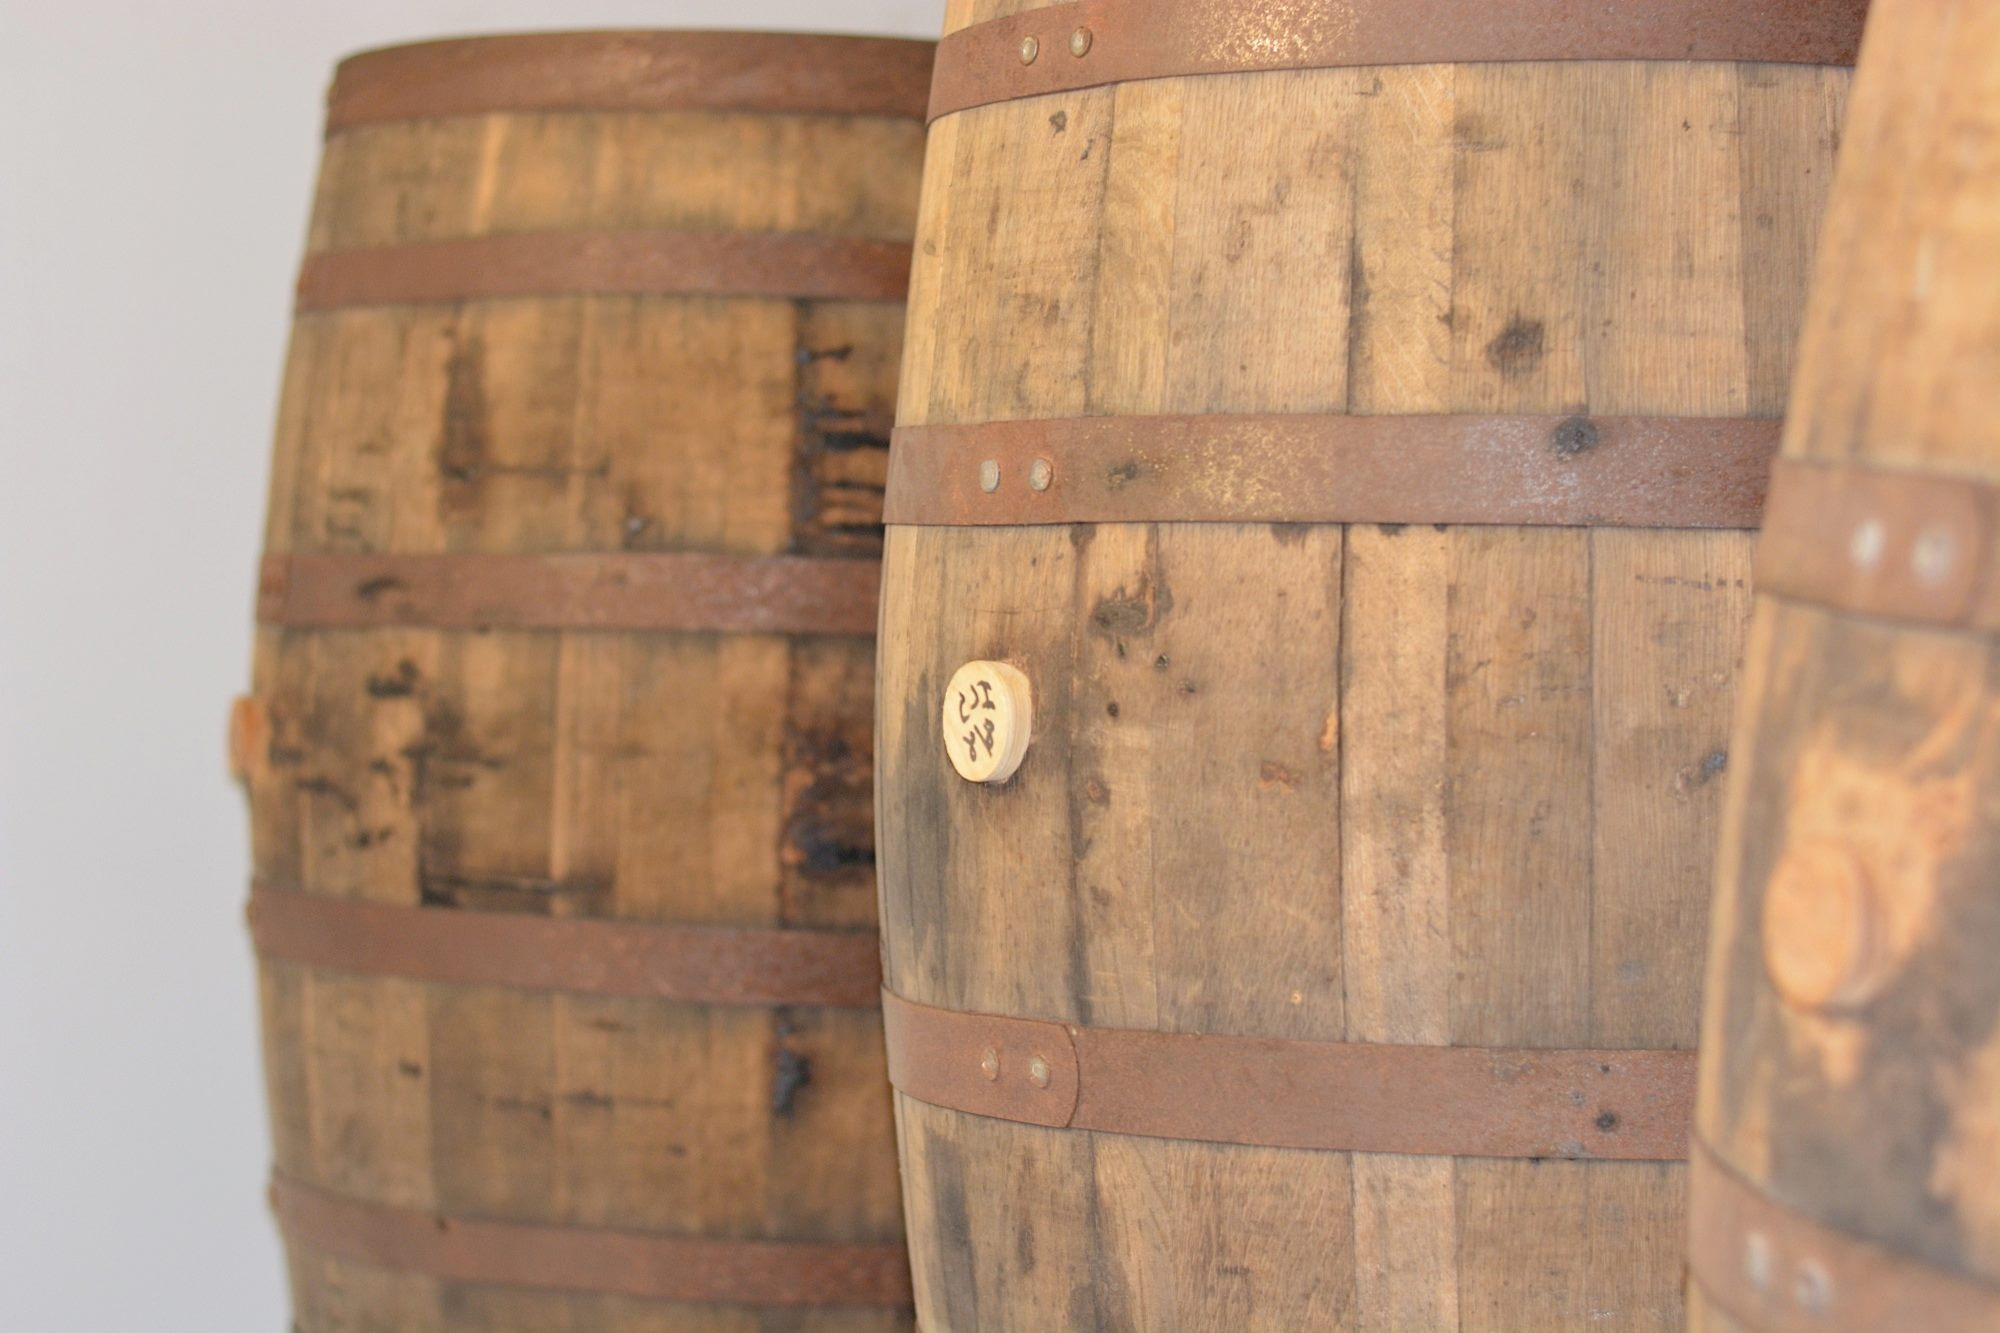 Silver Oak Cabernet barrels used to age NOLA Brewing's Swamp Grape Escape with Brettanomyces